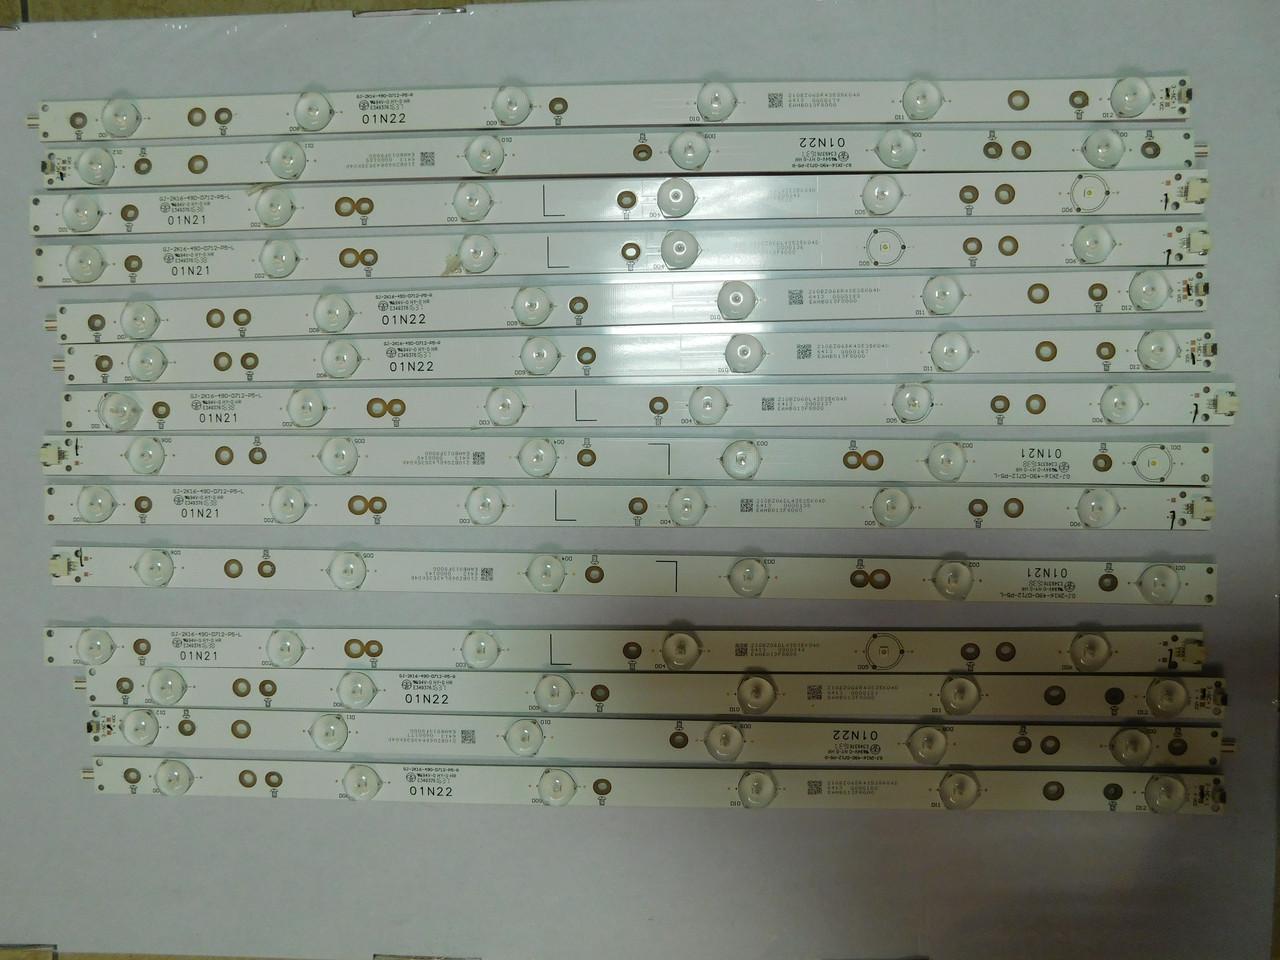 КОМПЛЕКТ LED ПЛАНОК СВЕТОДИОДНОЙ ПОДСВЕТКИ LCD ПАНЕЛИ (для телевизора Philips 49PUS6401/12),бу